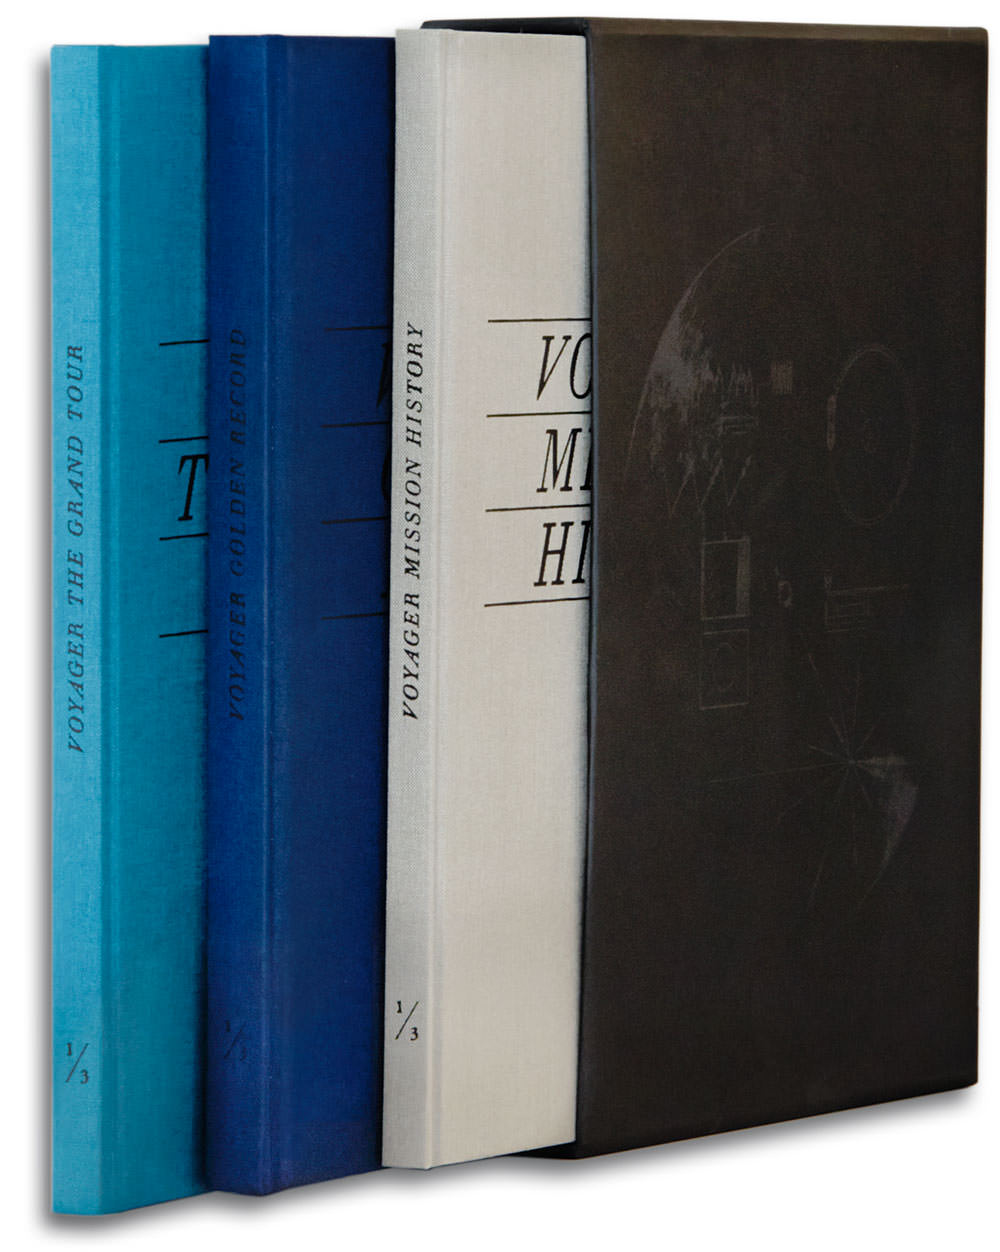 Drittel-Books-Voyager_Schuber-02.jpg